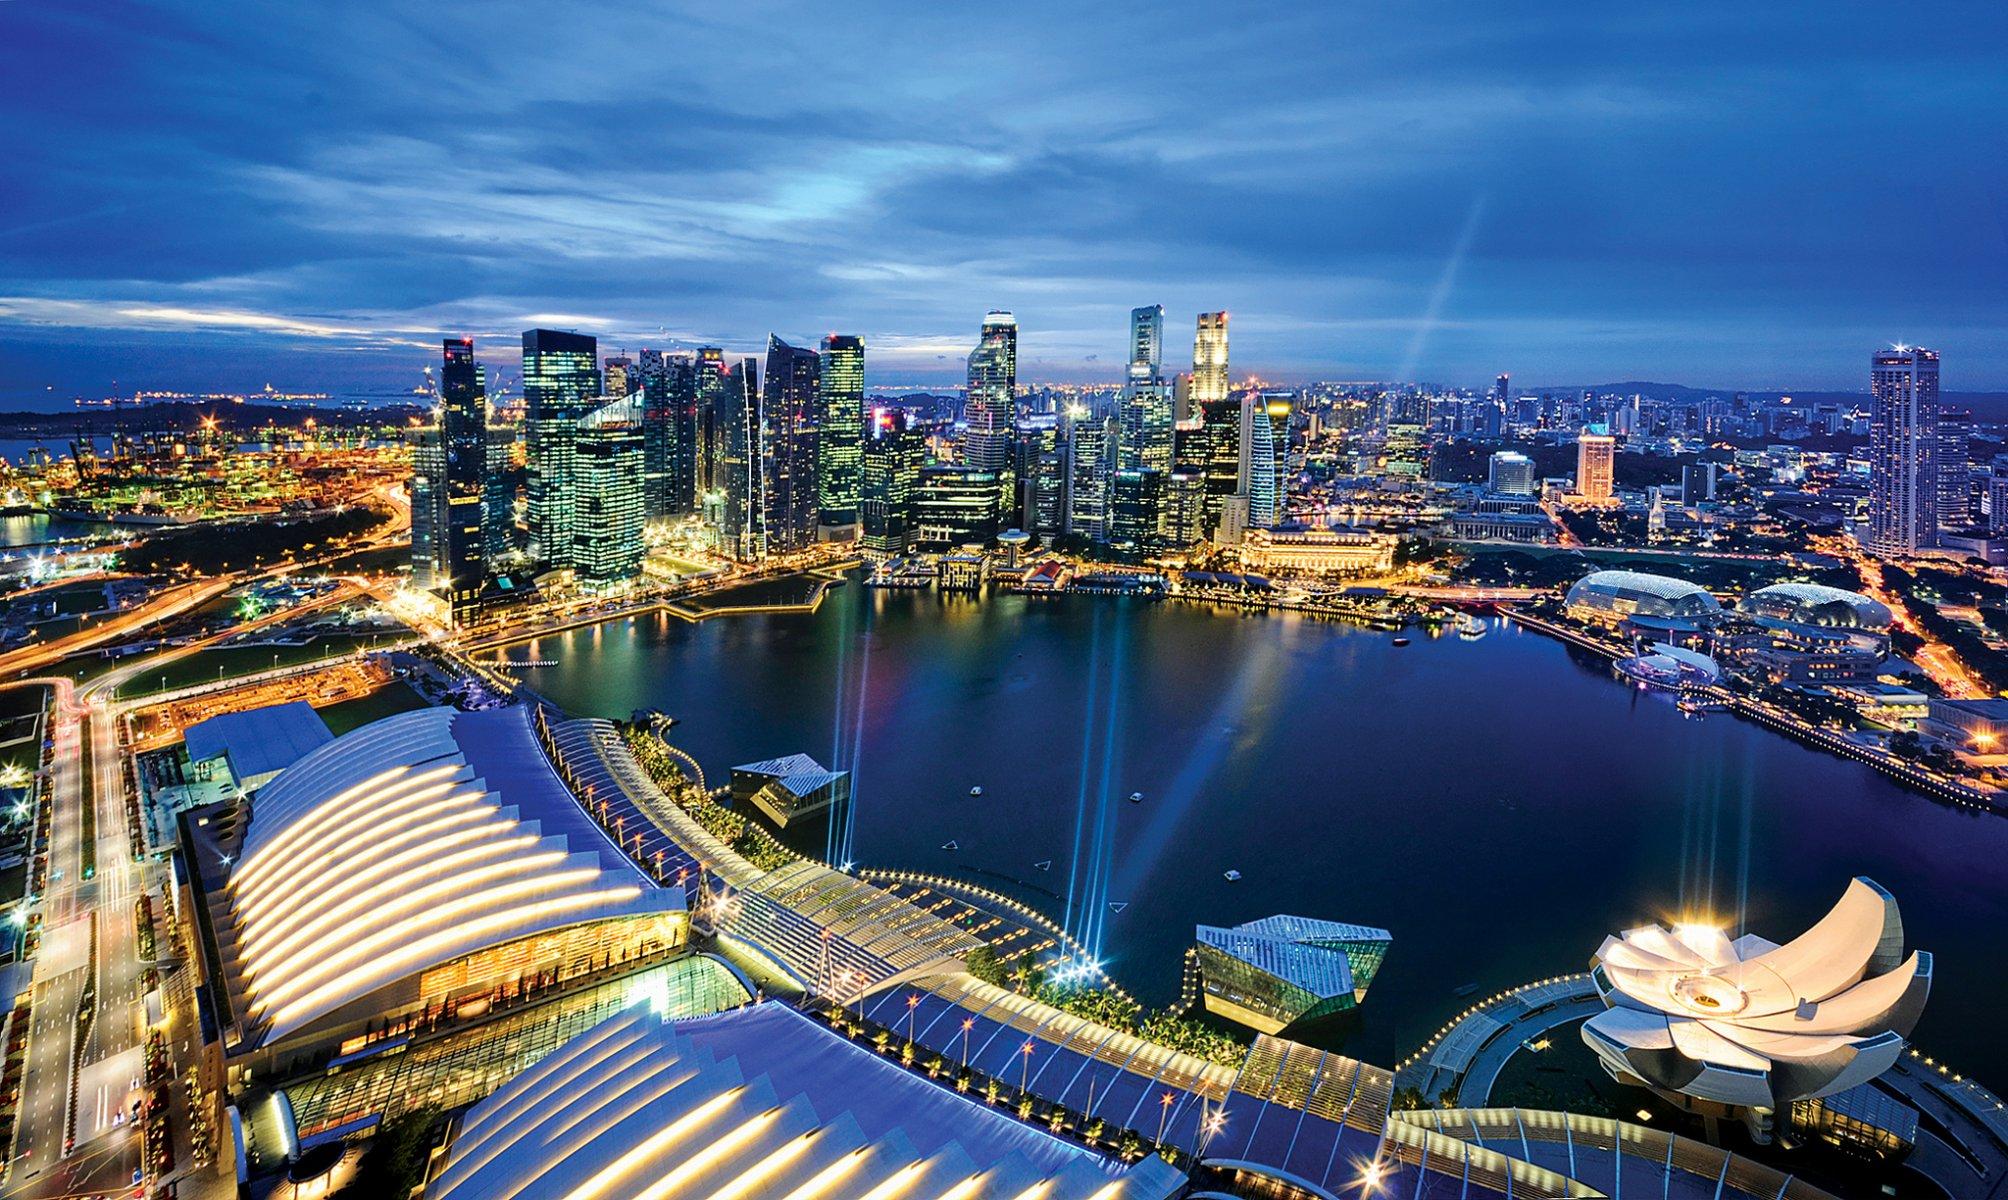 красивые фото на фоне сингапура следующий раз